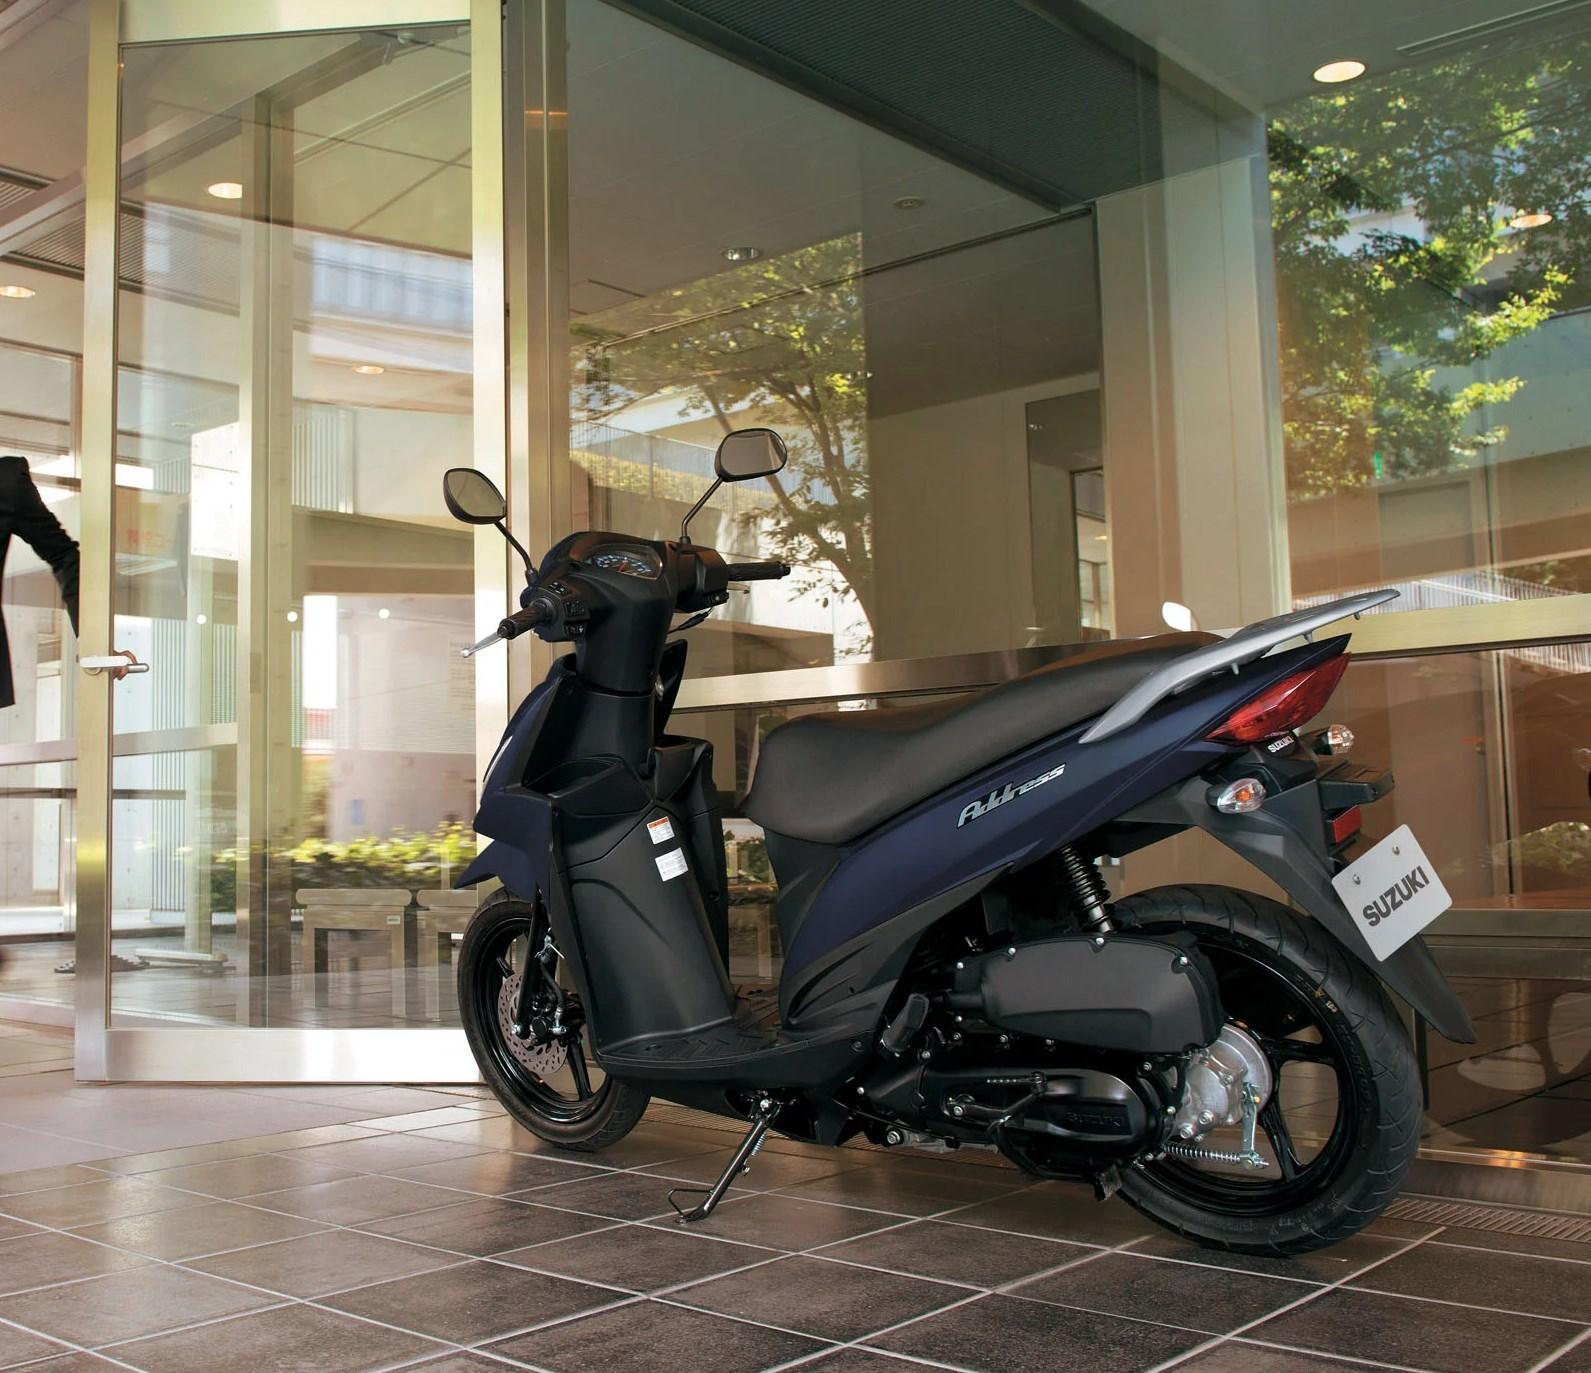 sydney-scooter-hire-ubereats-menulog